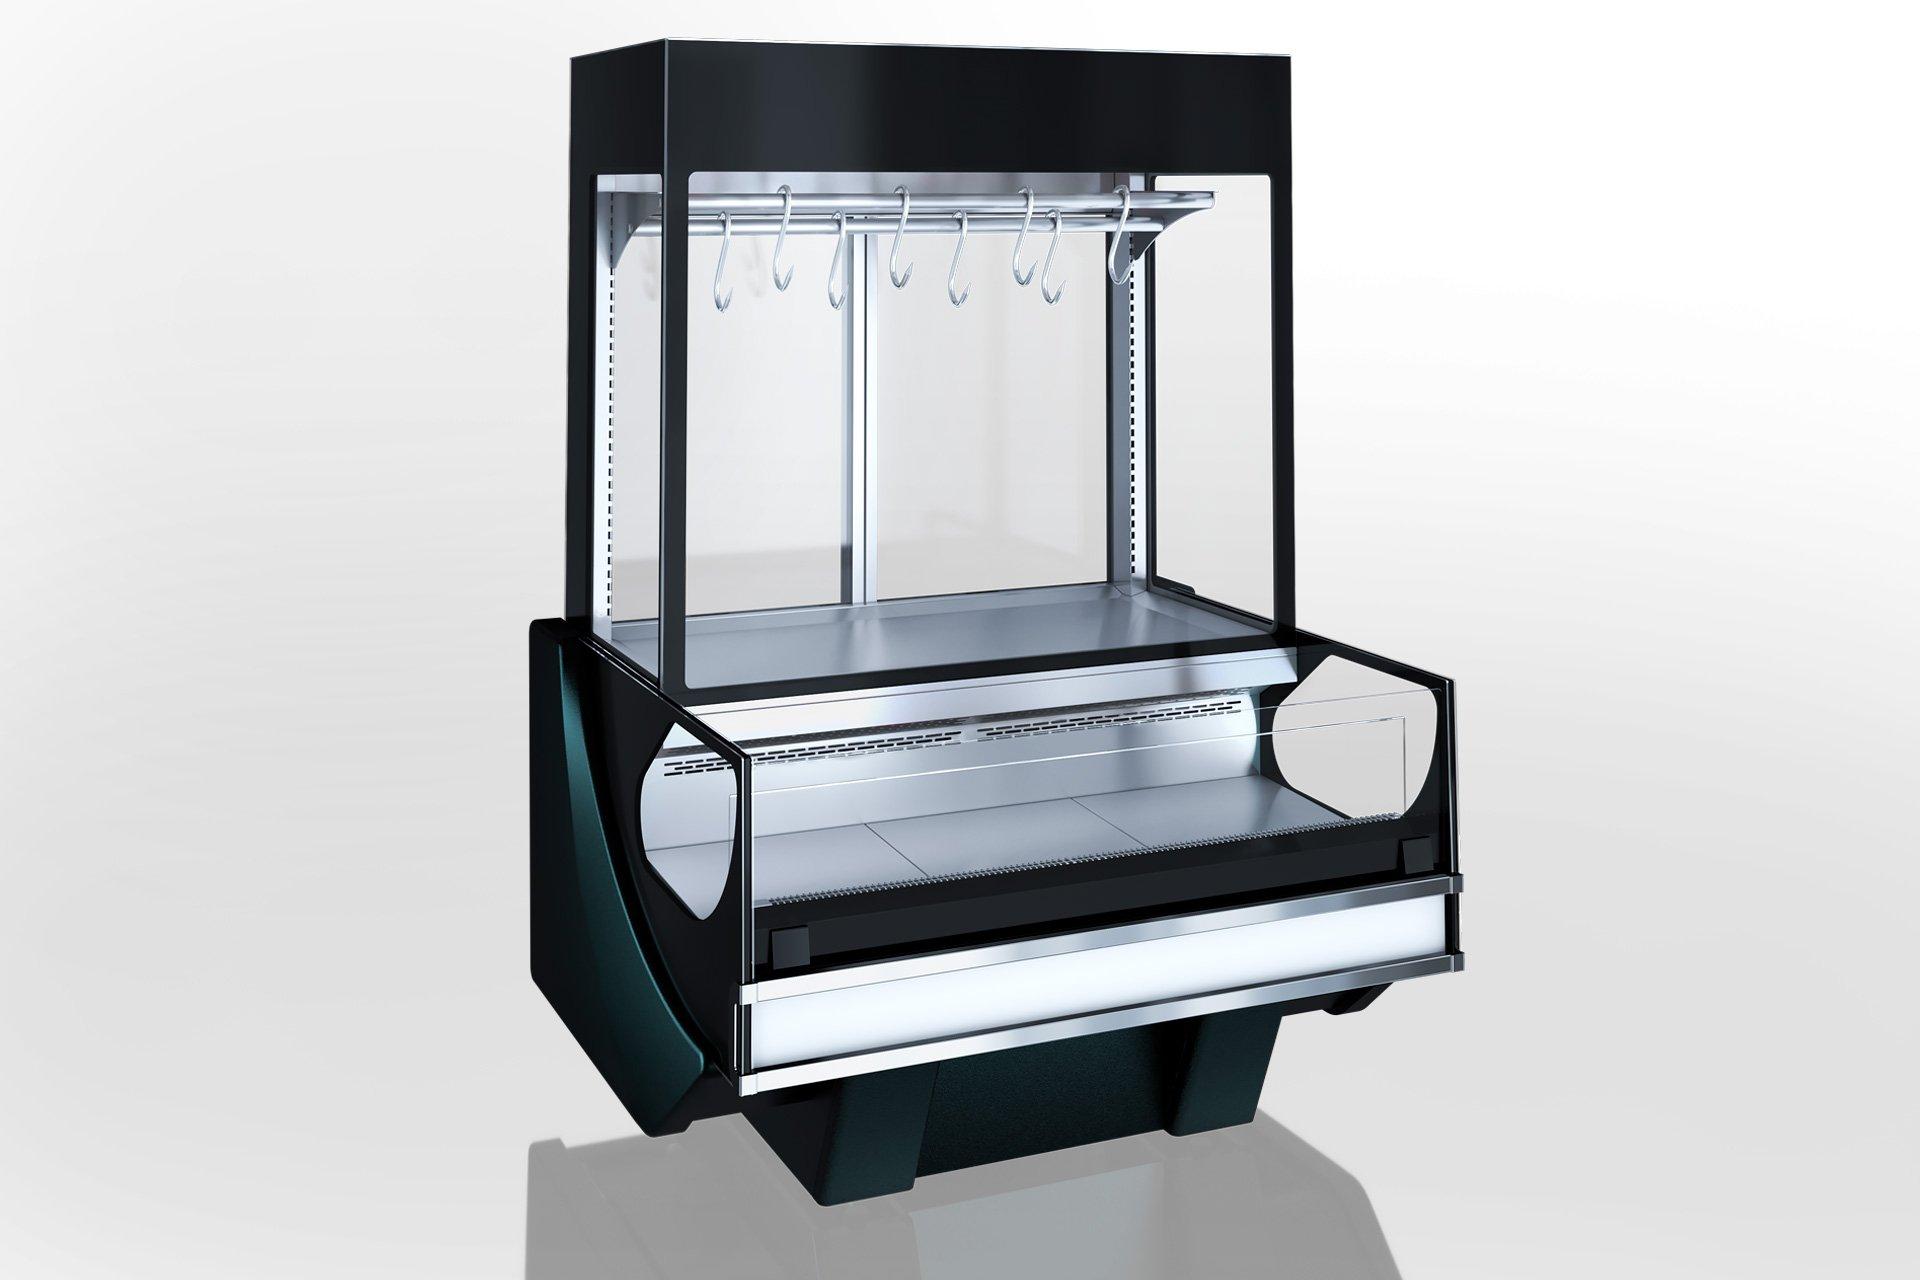 מקרר ויטרינה MISSOURI COLD DIAMOND MC 125 CRYSTAL COMBI S M/A